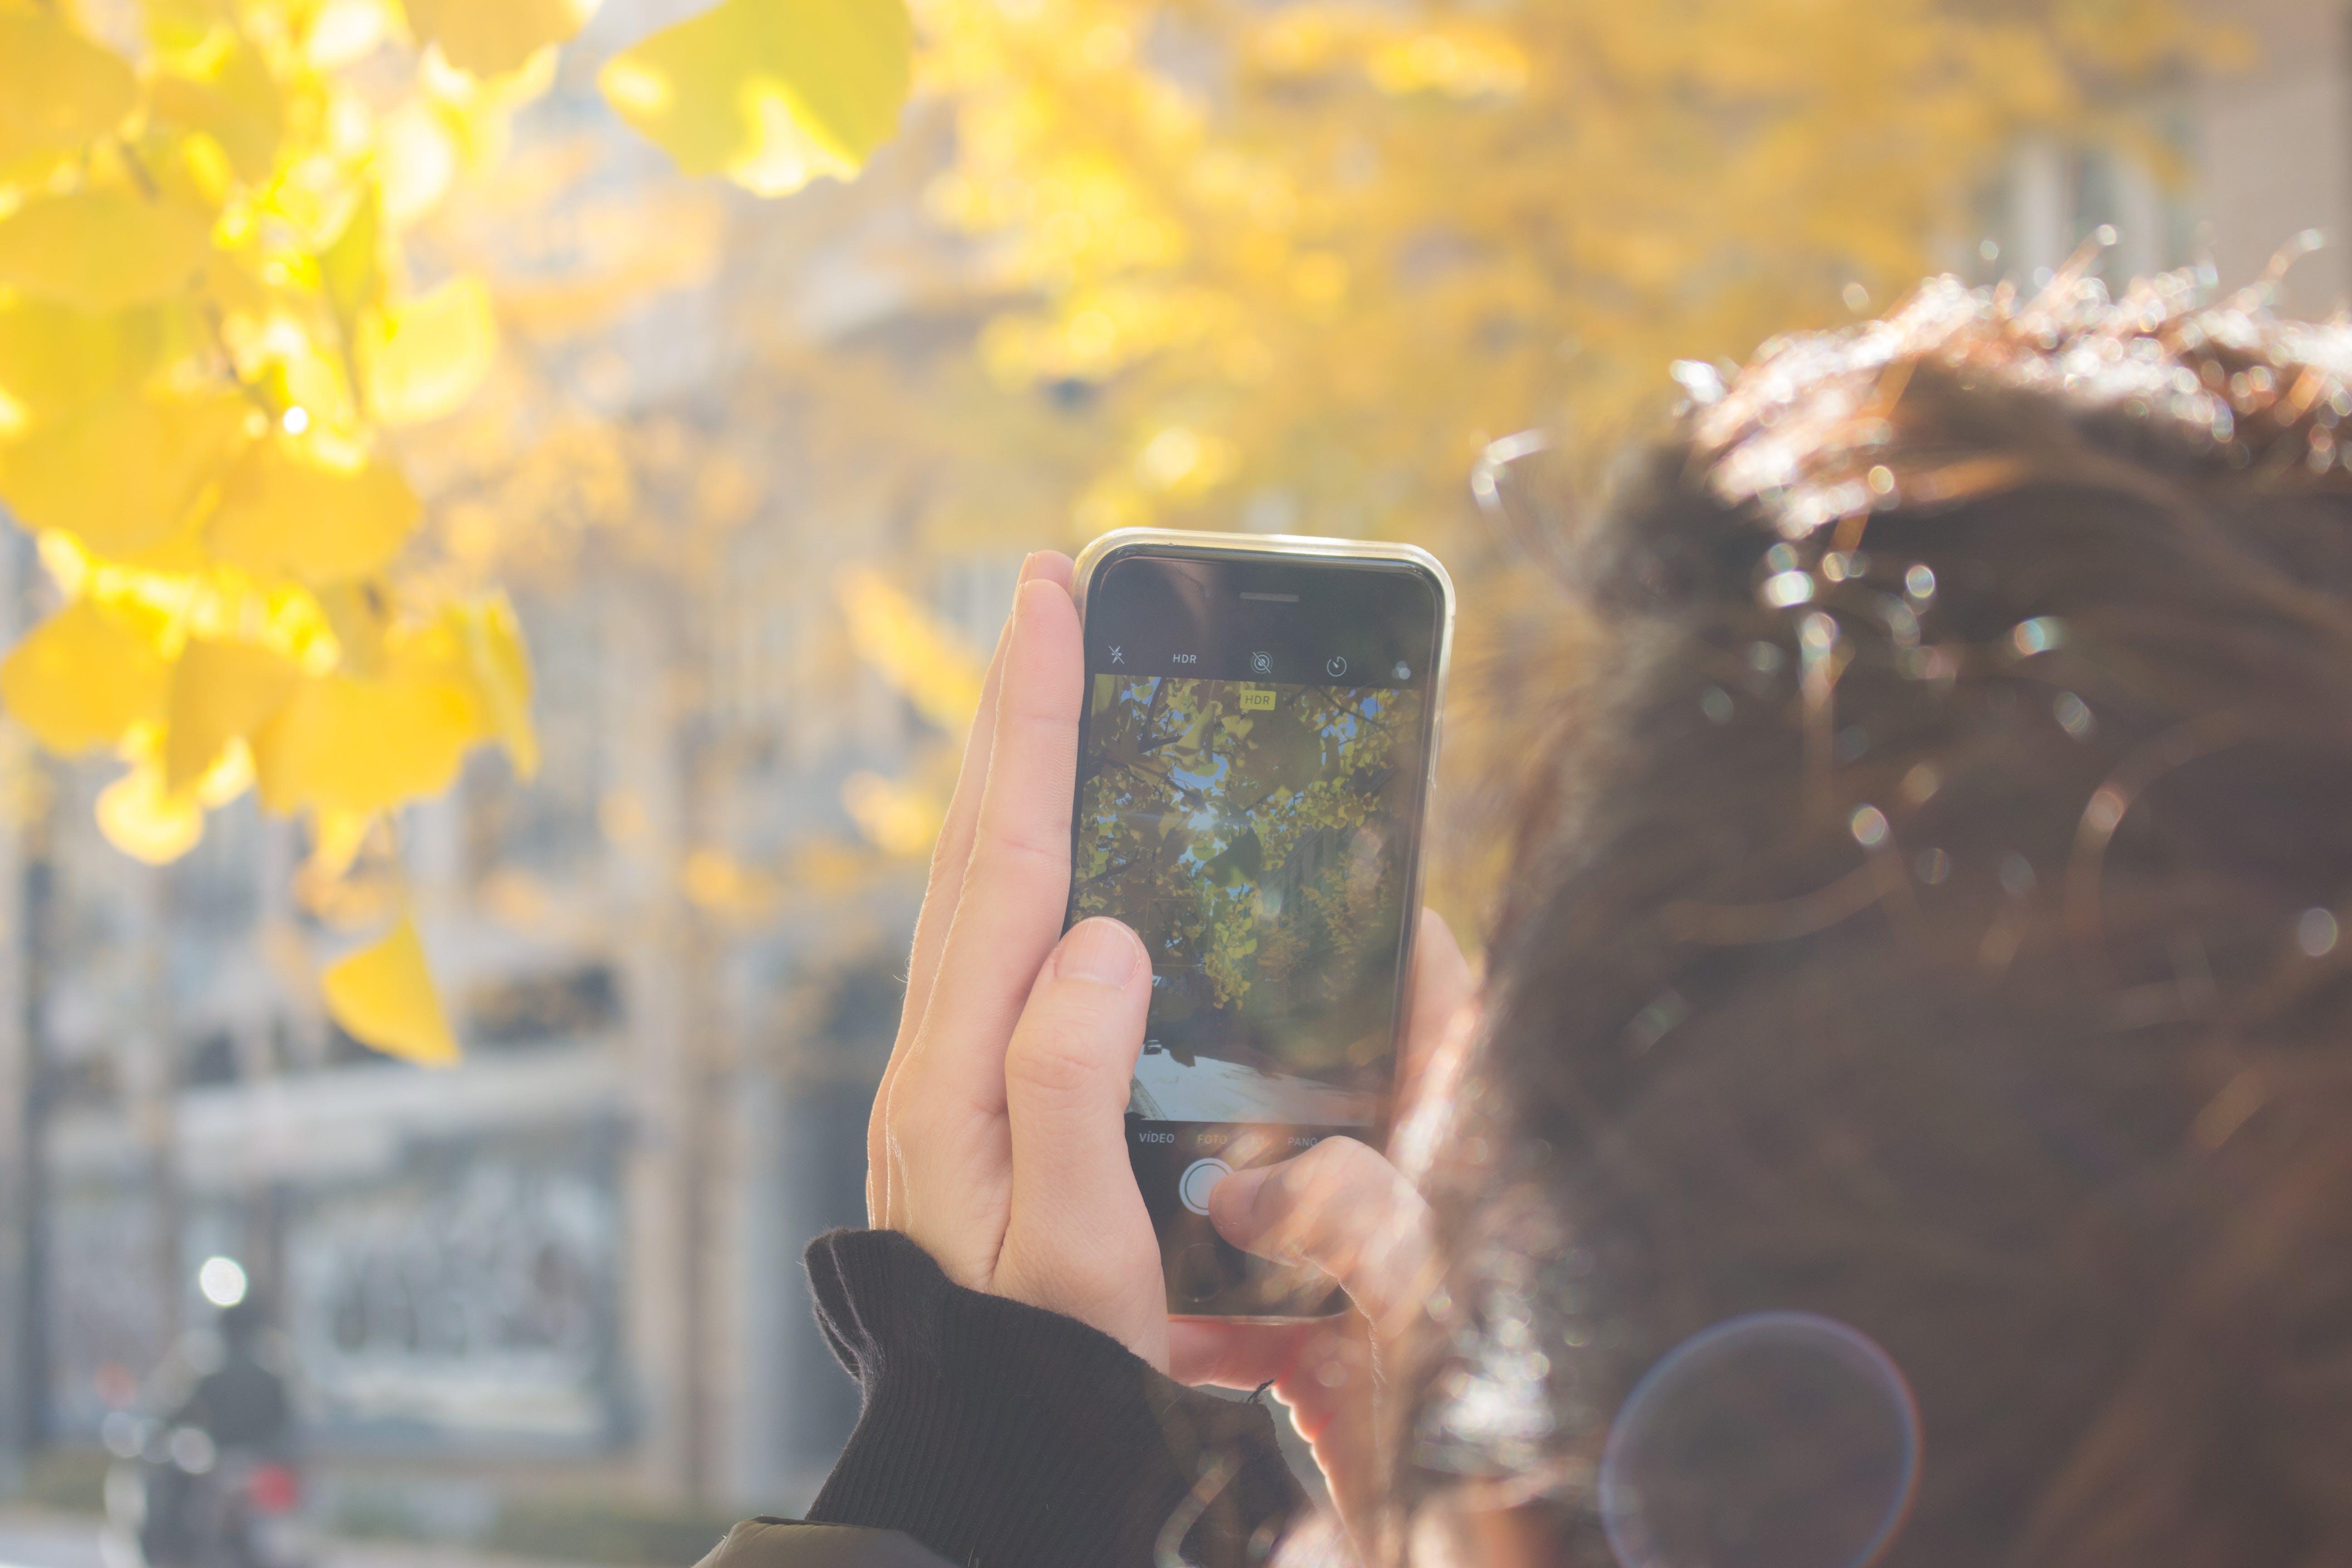 Man Wearing Black Jacket Using Iphone Taking Picture of Green Leaf Tree